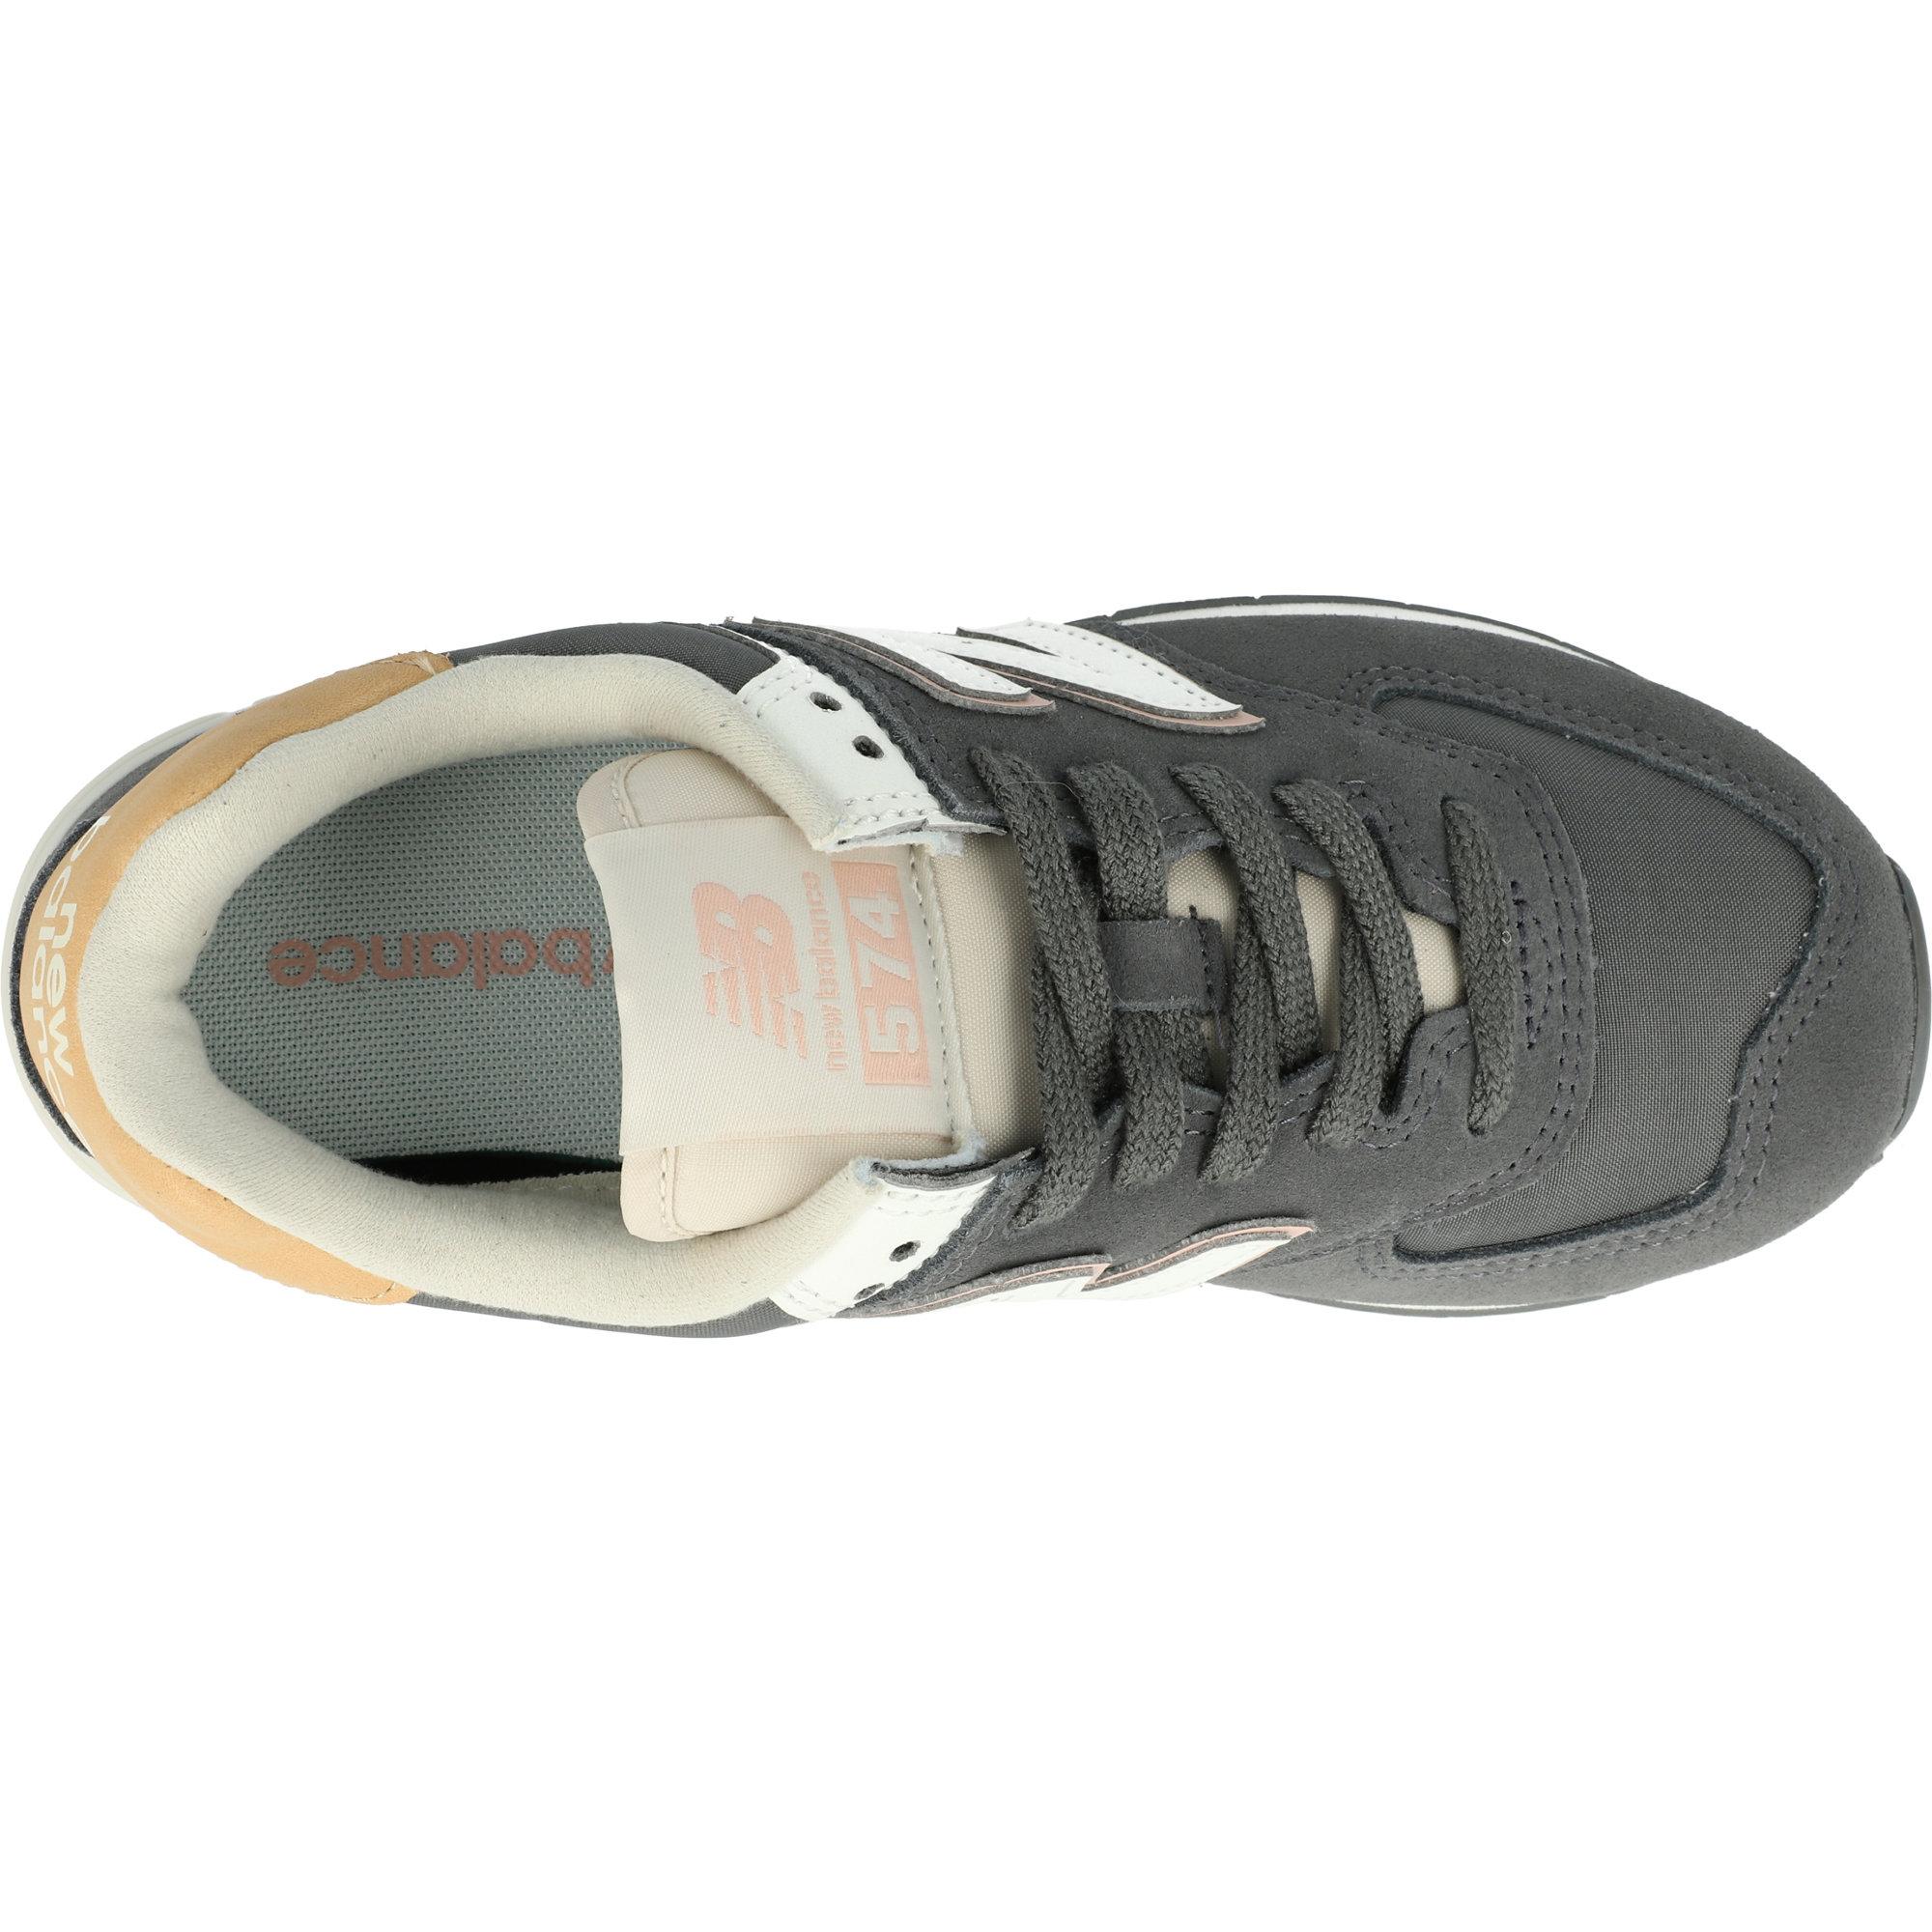 new balance 574 grigio pelle